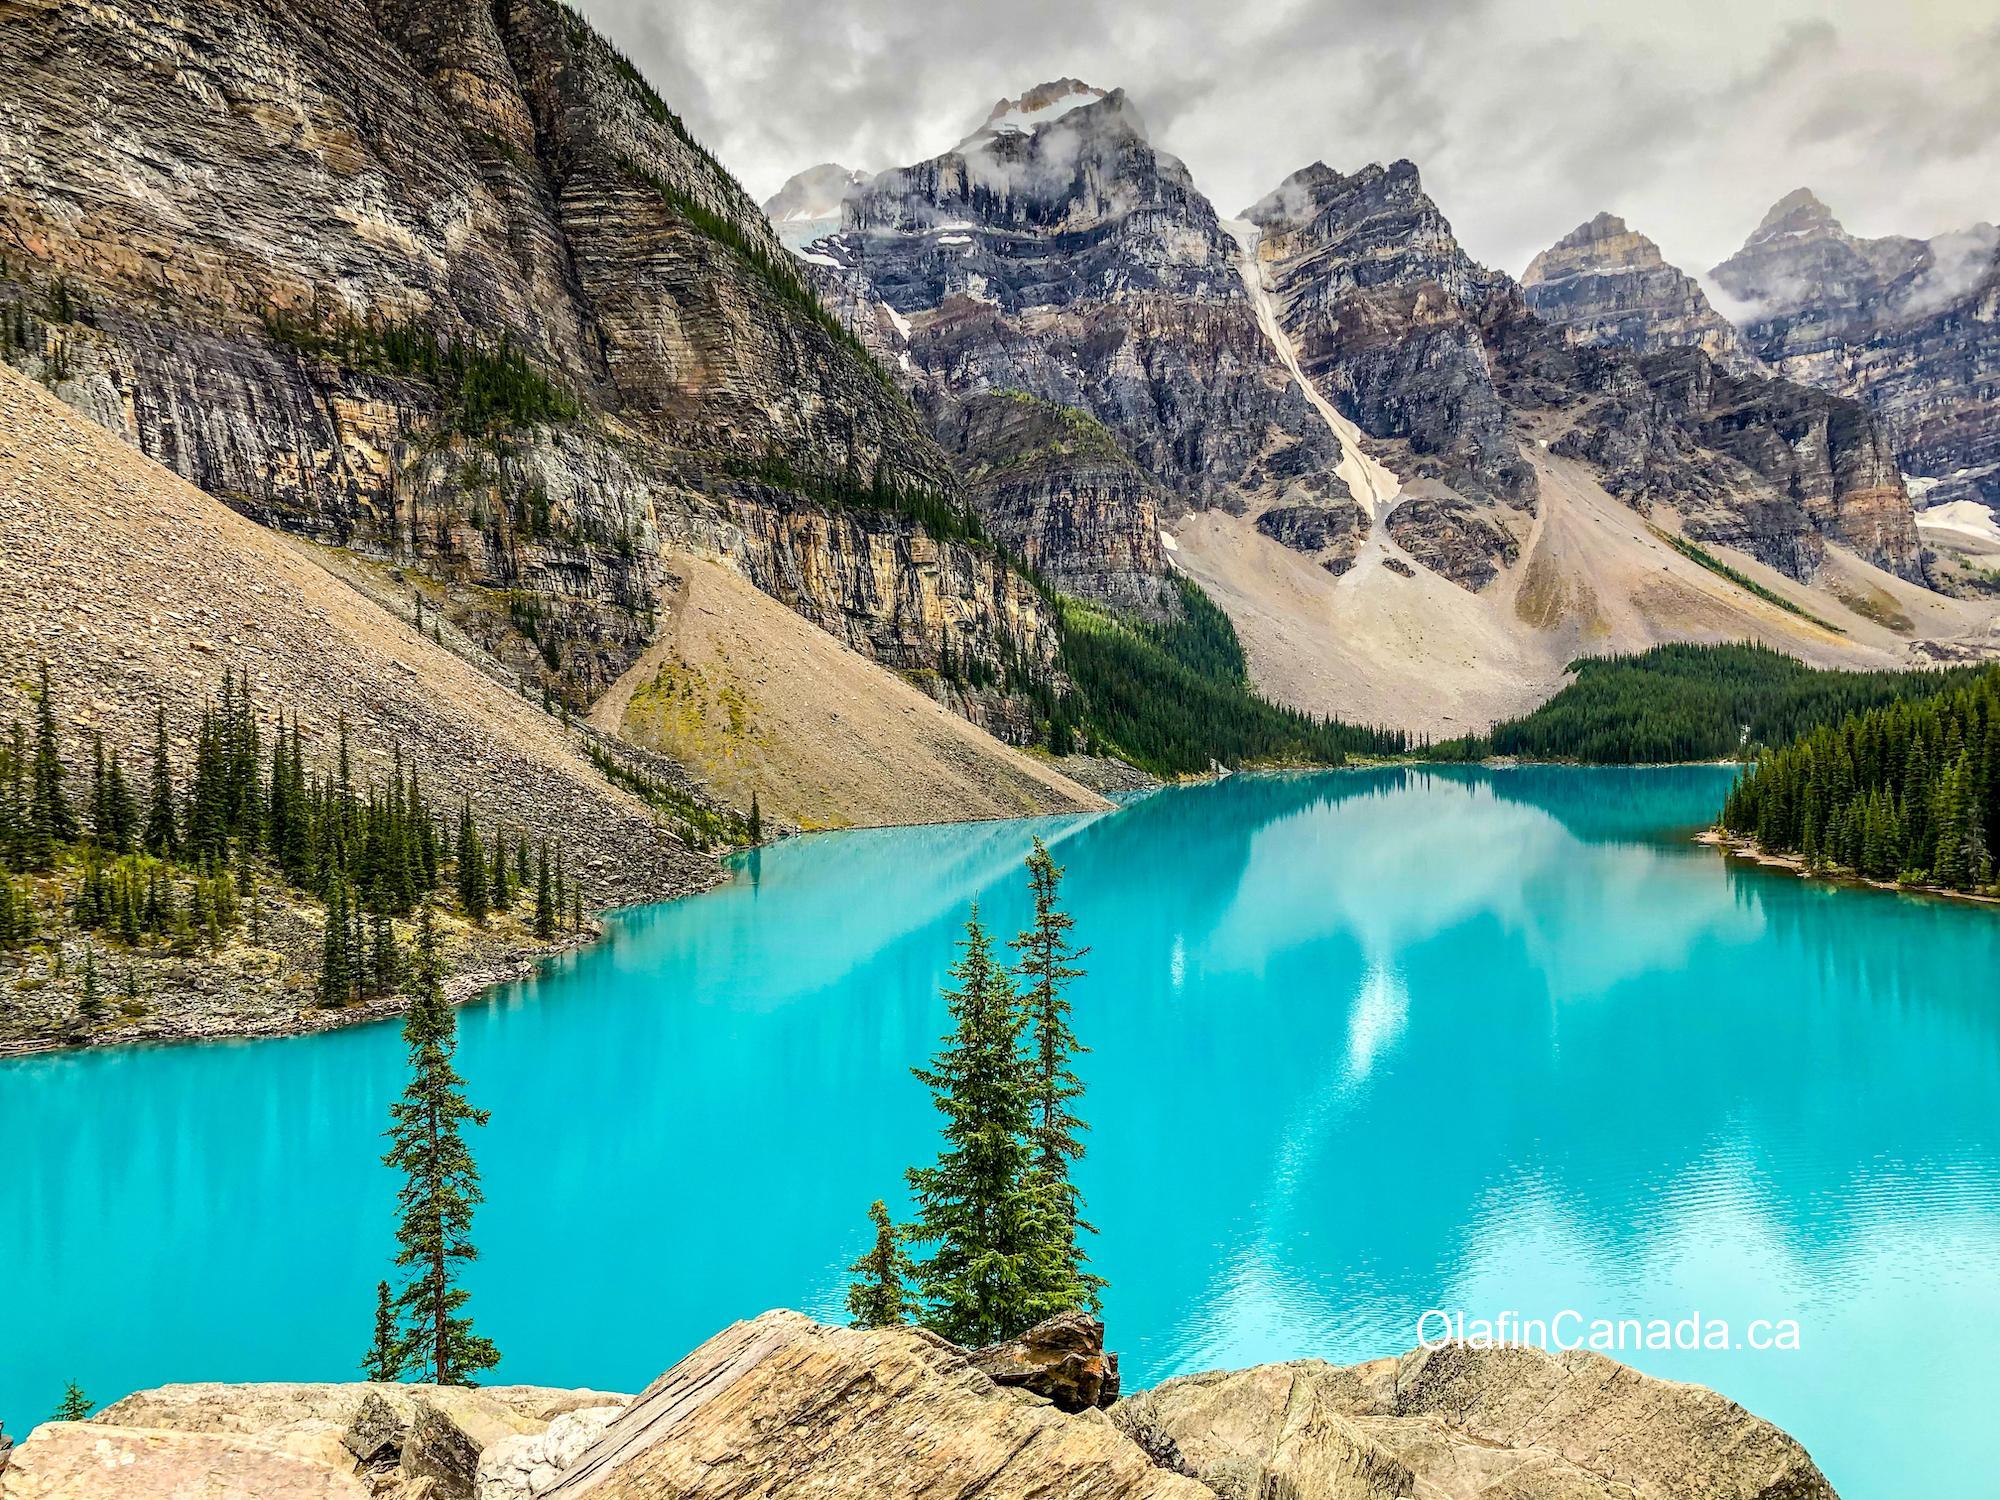 Moraine Lake and the valley of the Ten Peaks, turquoise coloured #olafincanada #alberta #rockies #morainelake #valleyofthe10peaks